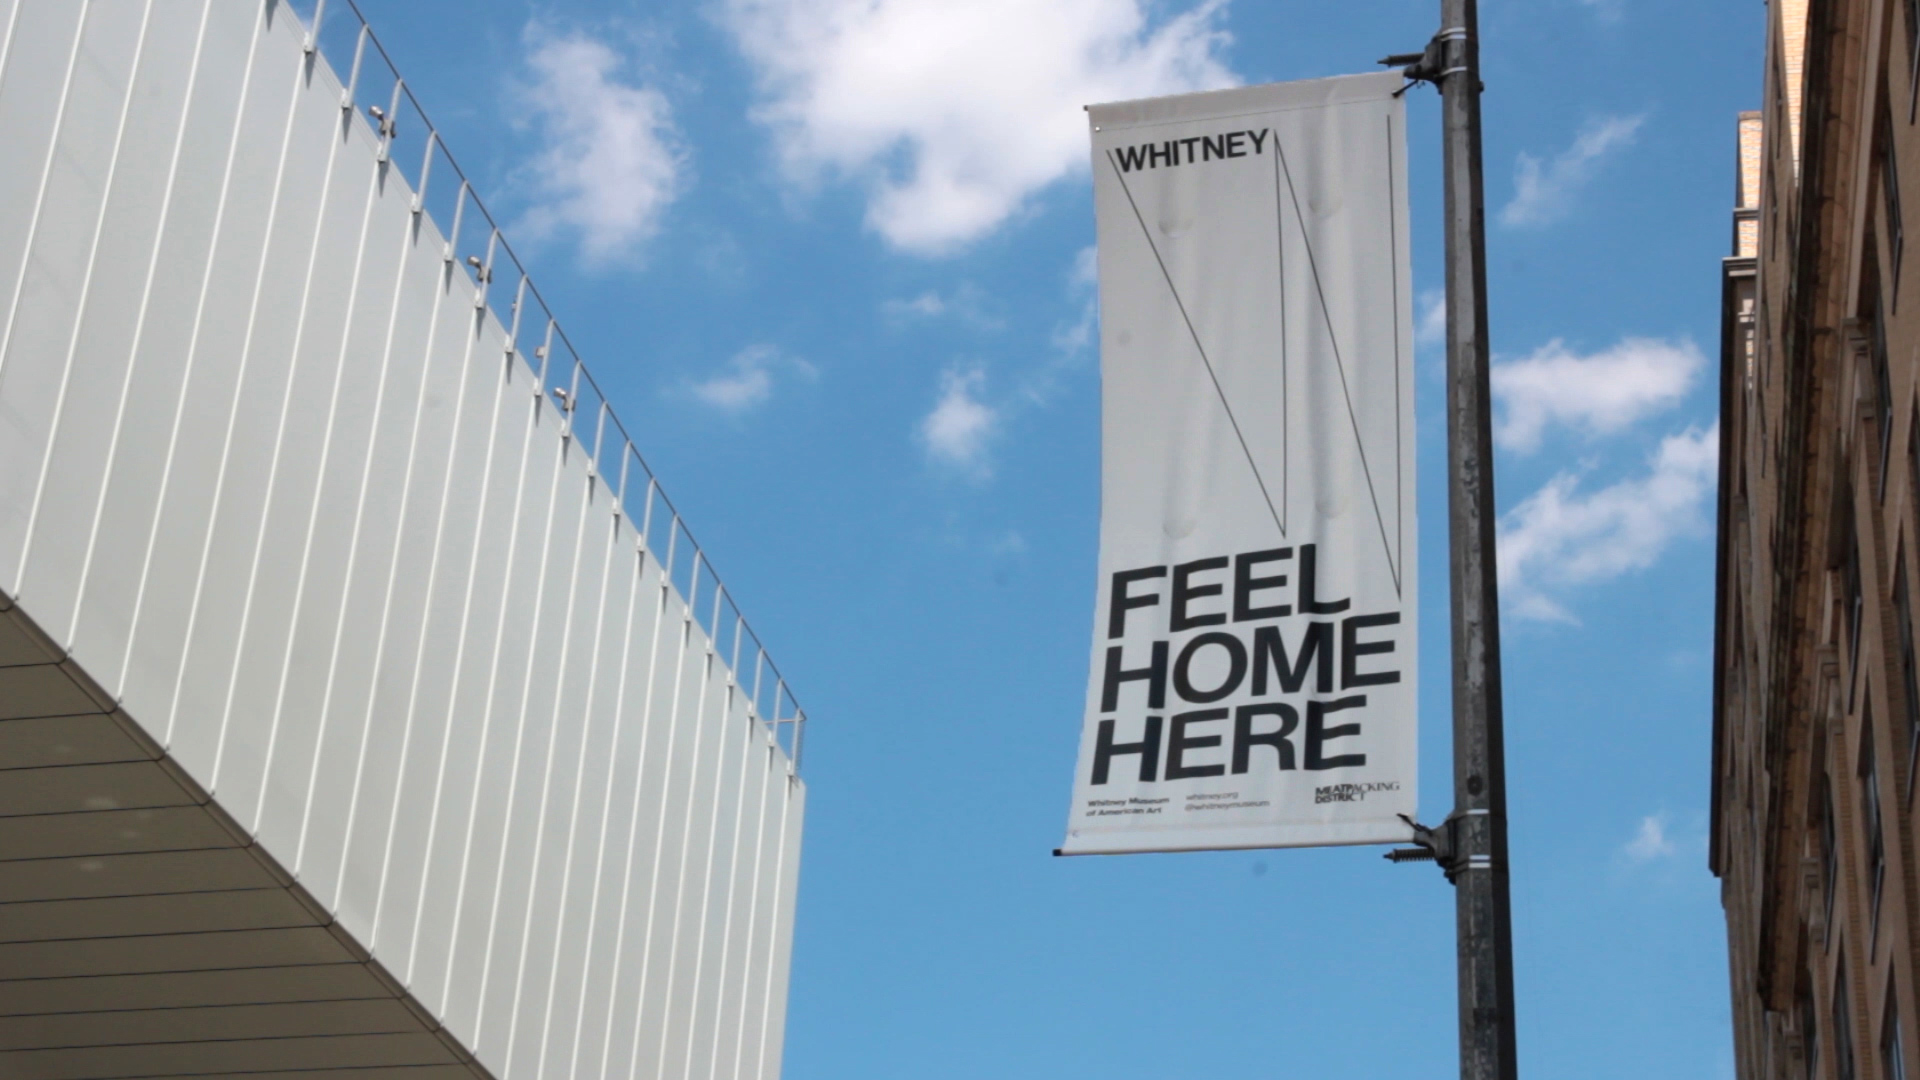 Feel Home Here; Feel Local Here, Feel New York Here.  Banner from Whitney Museum of American Art, New York. 2018